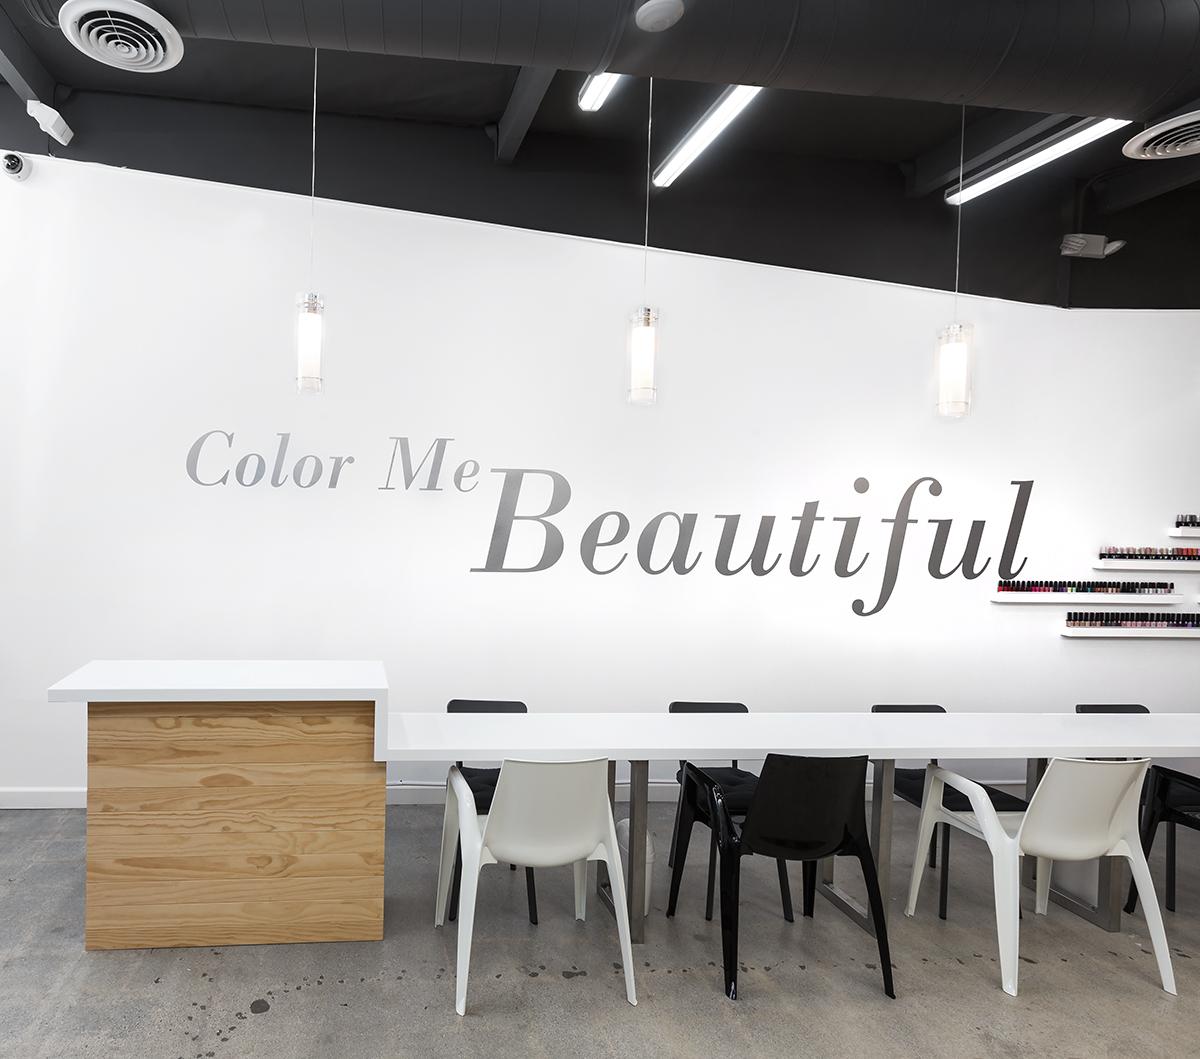 ColorMeBeautiful_017.jpg